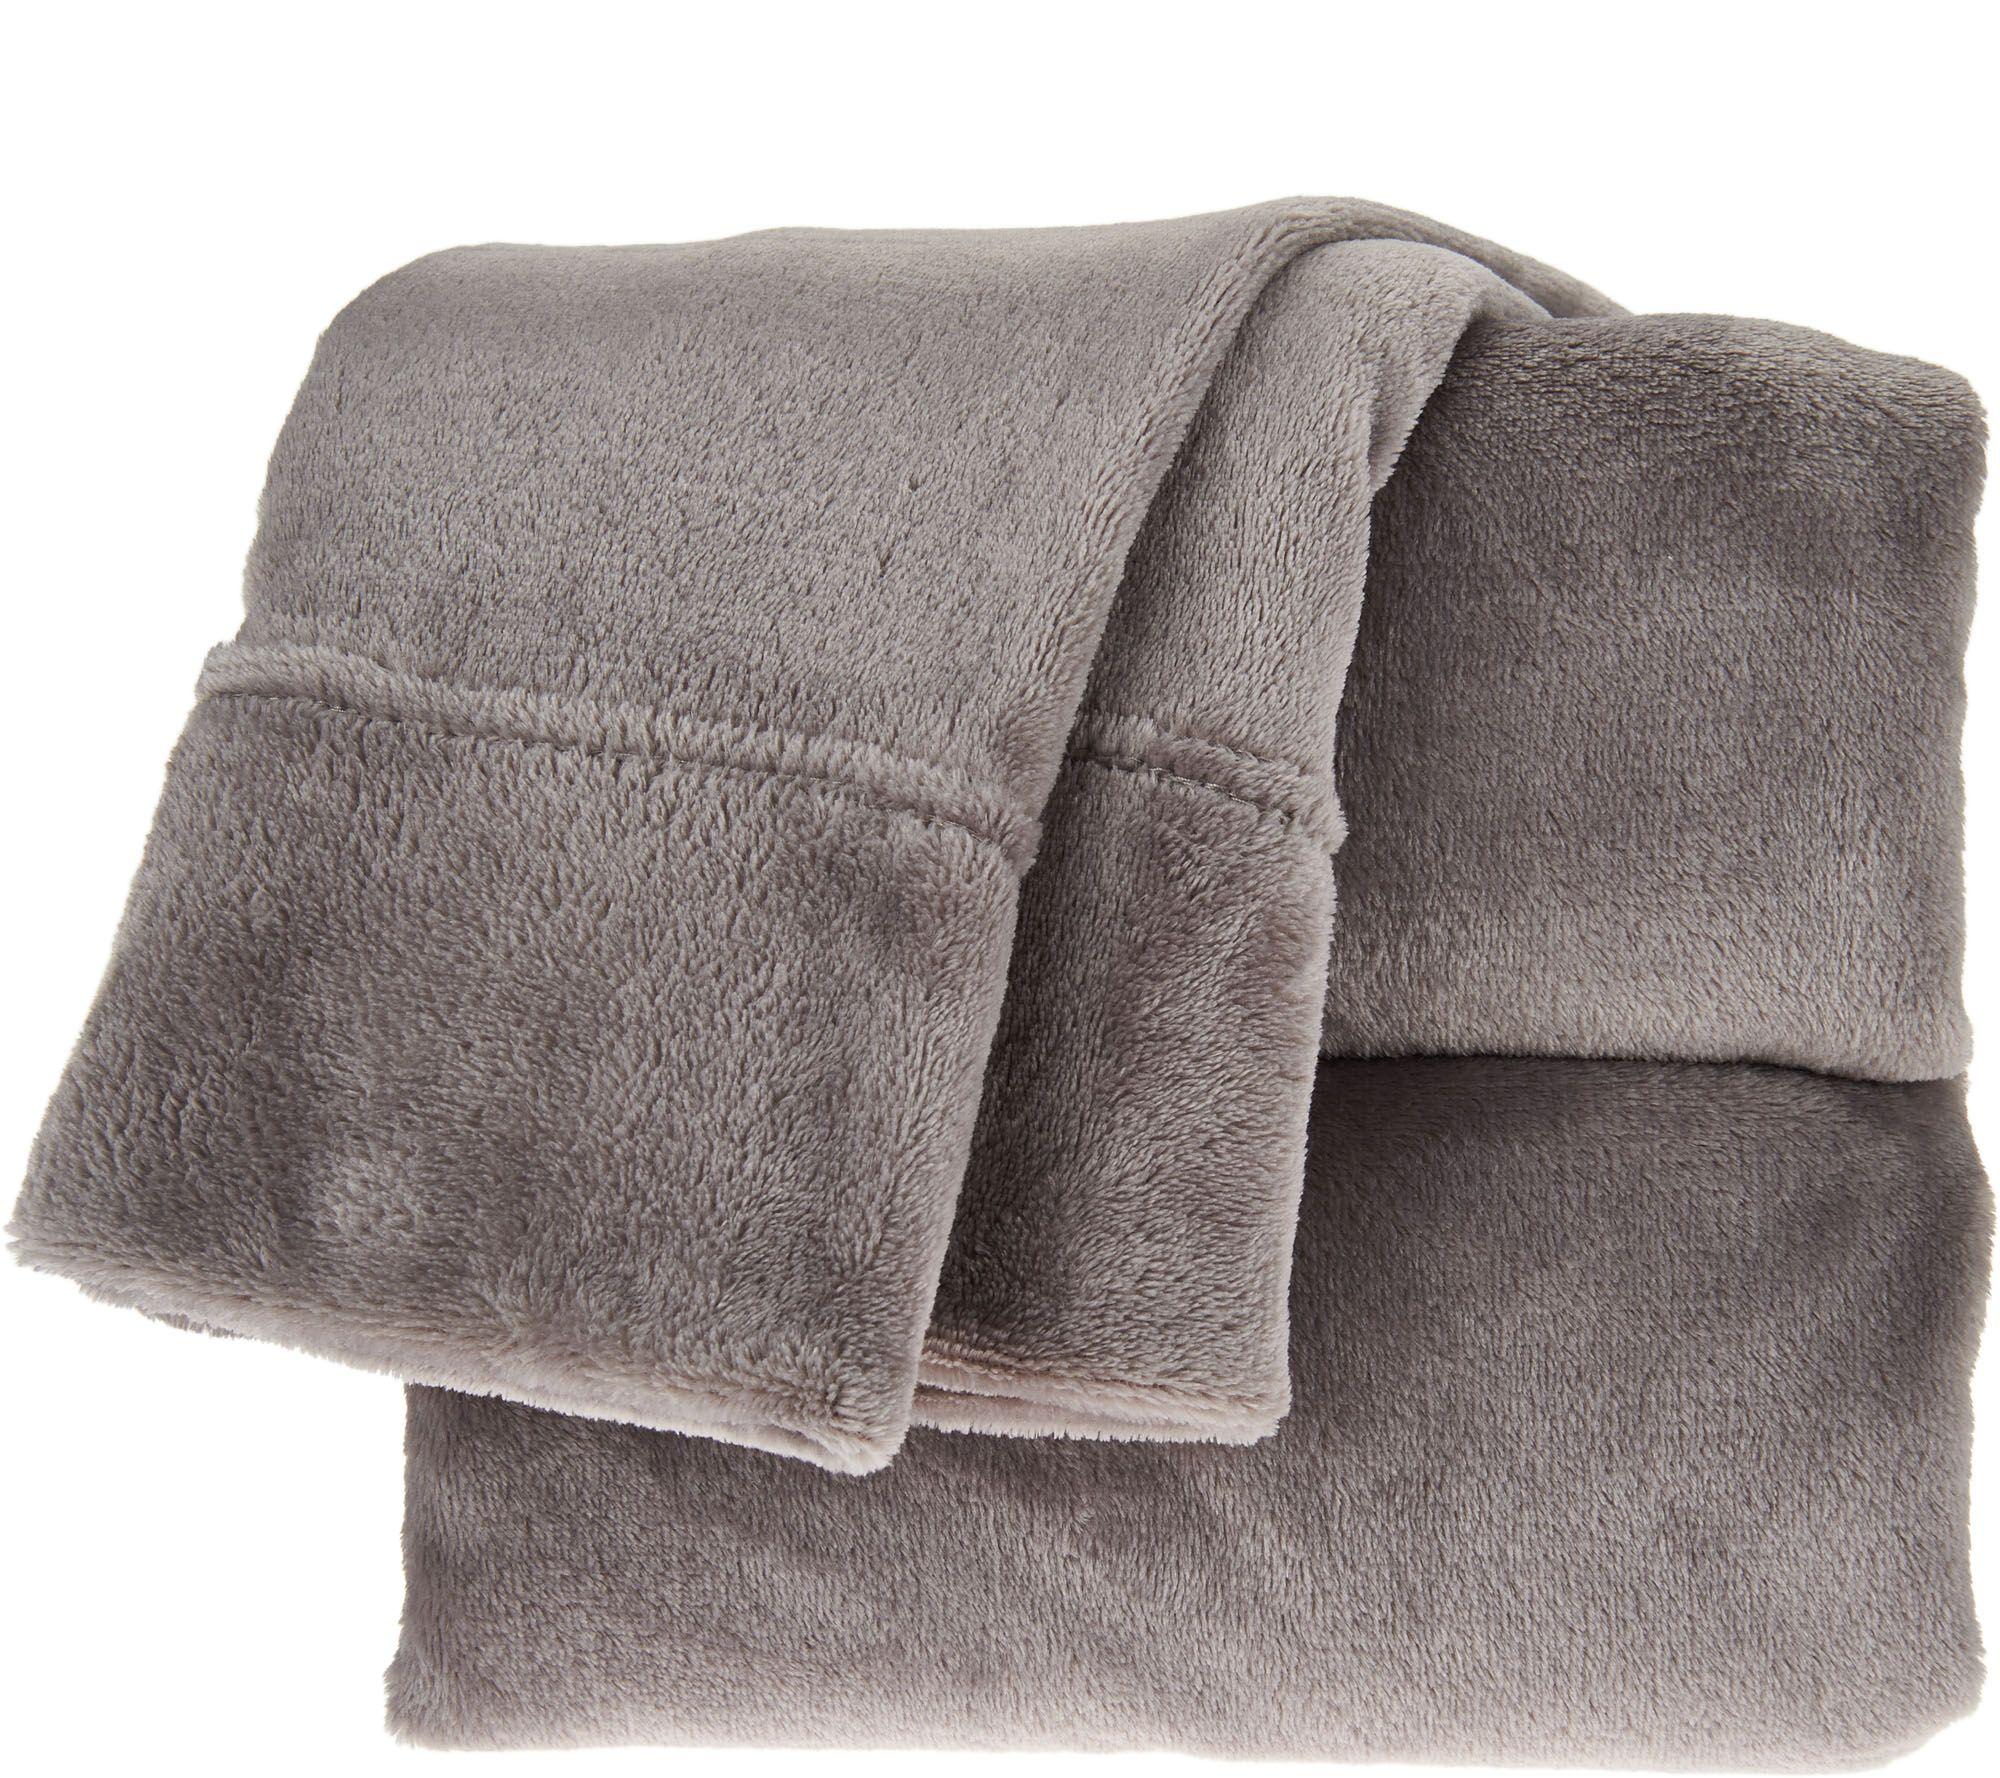 Berkshire Blanket Velvet Soft Queen Cozy Sheet Set Page